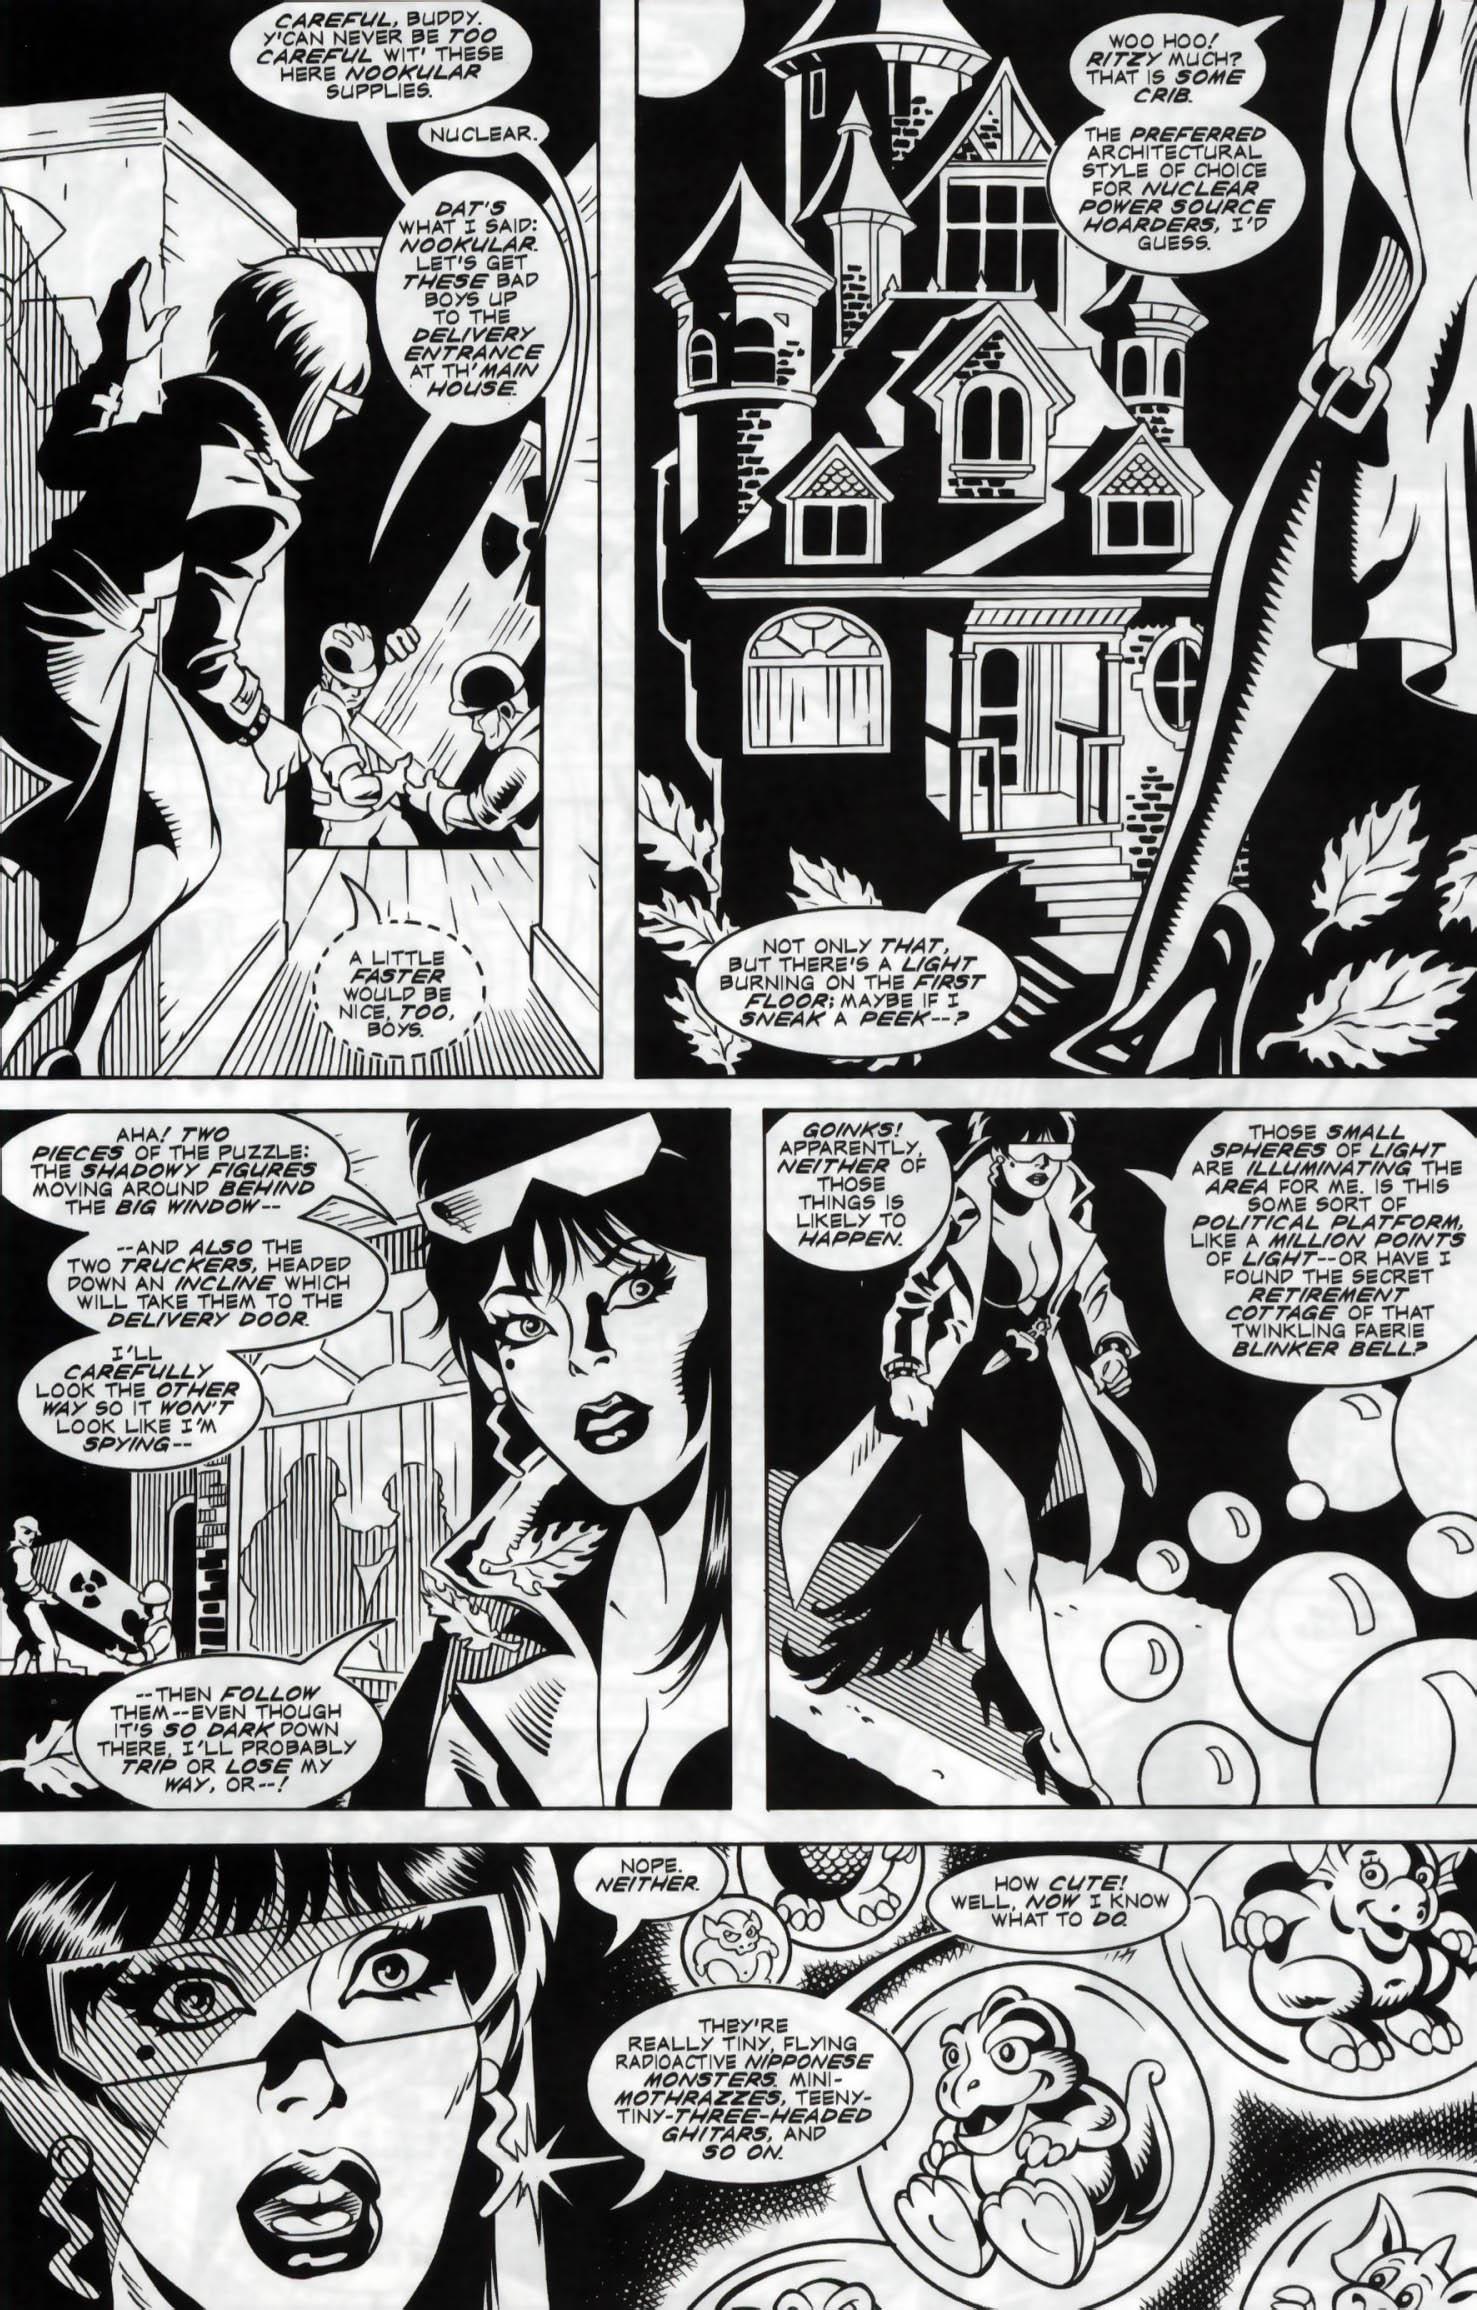 Read online Elvira, Mistress of the Dark comic -  Issue #120 - 23